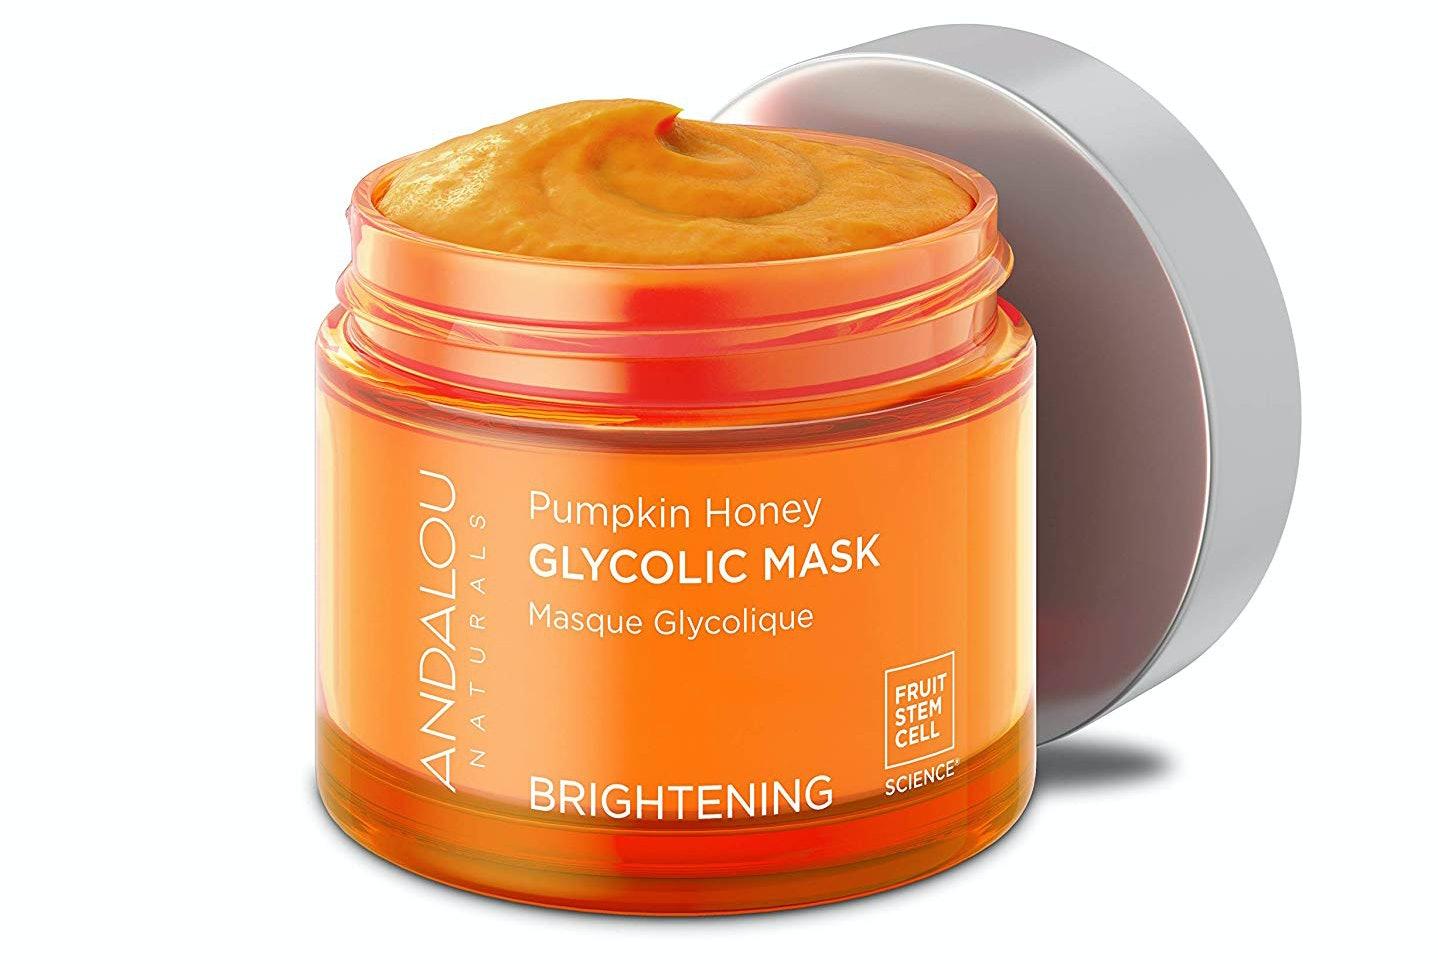 The 5 Best Face Masks on Amazon